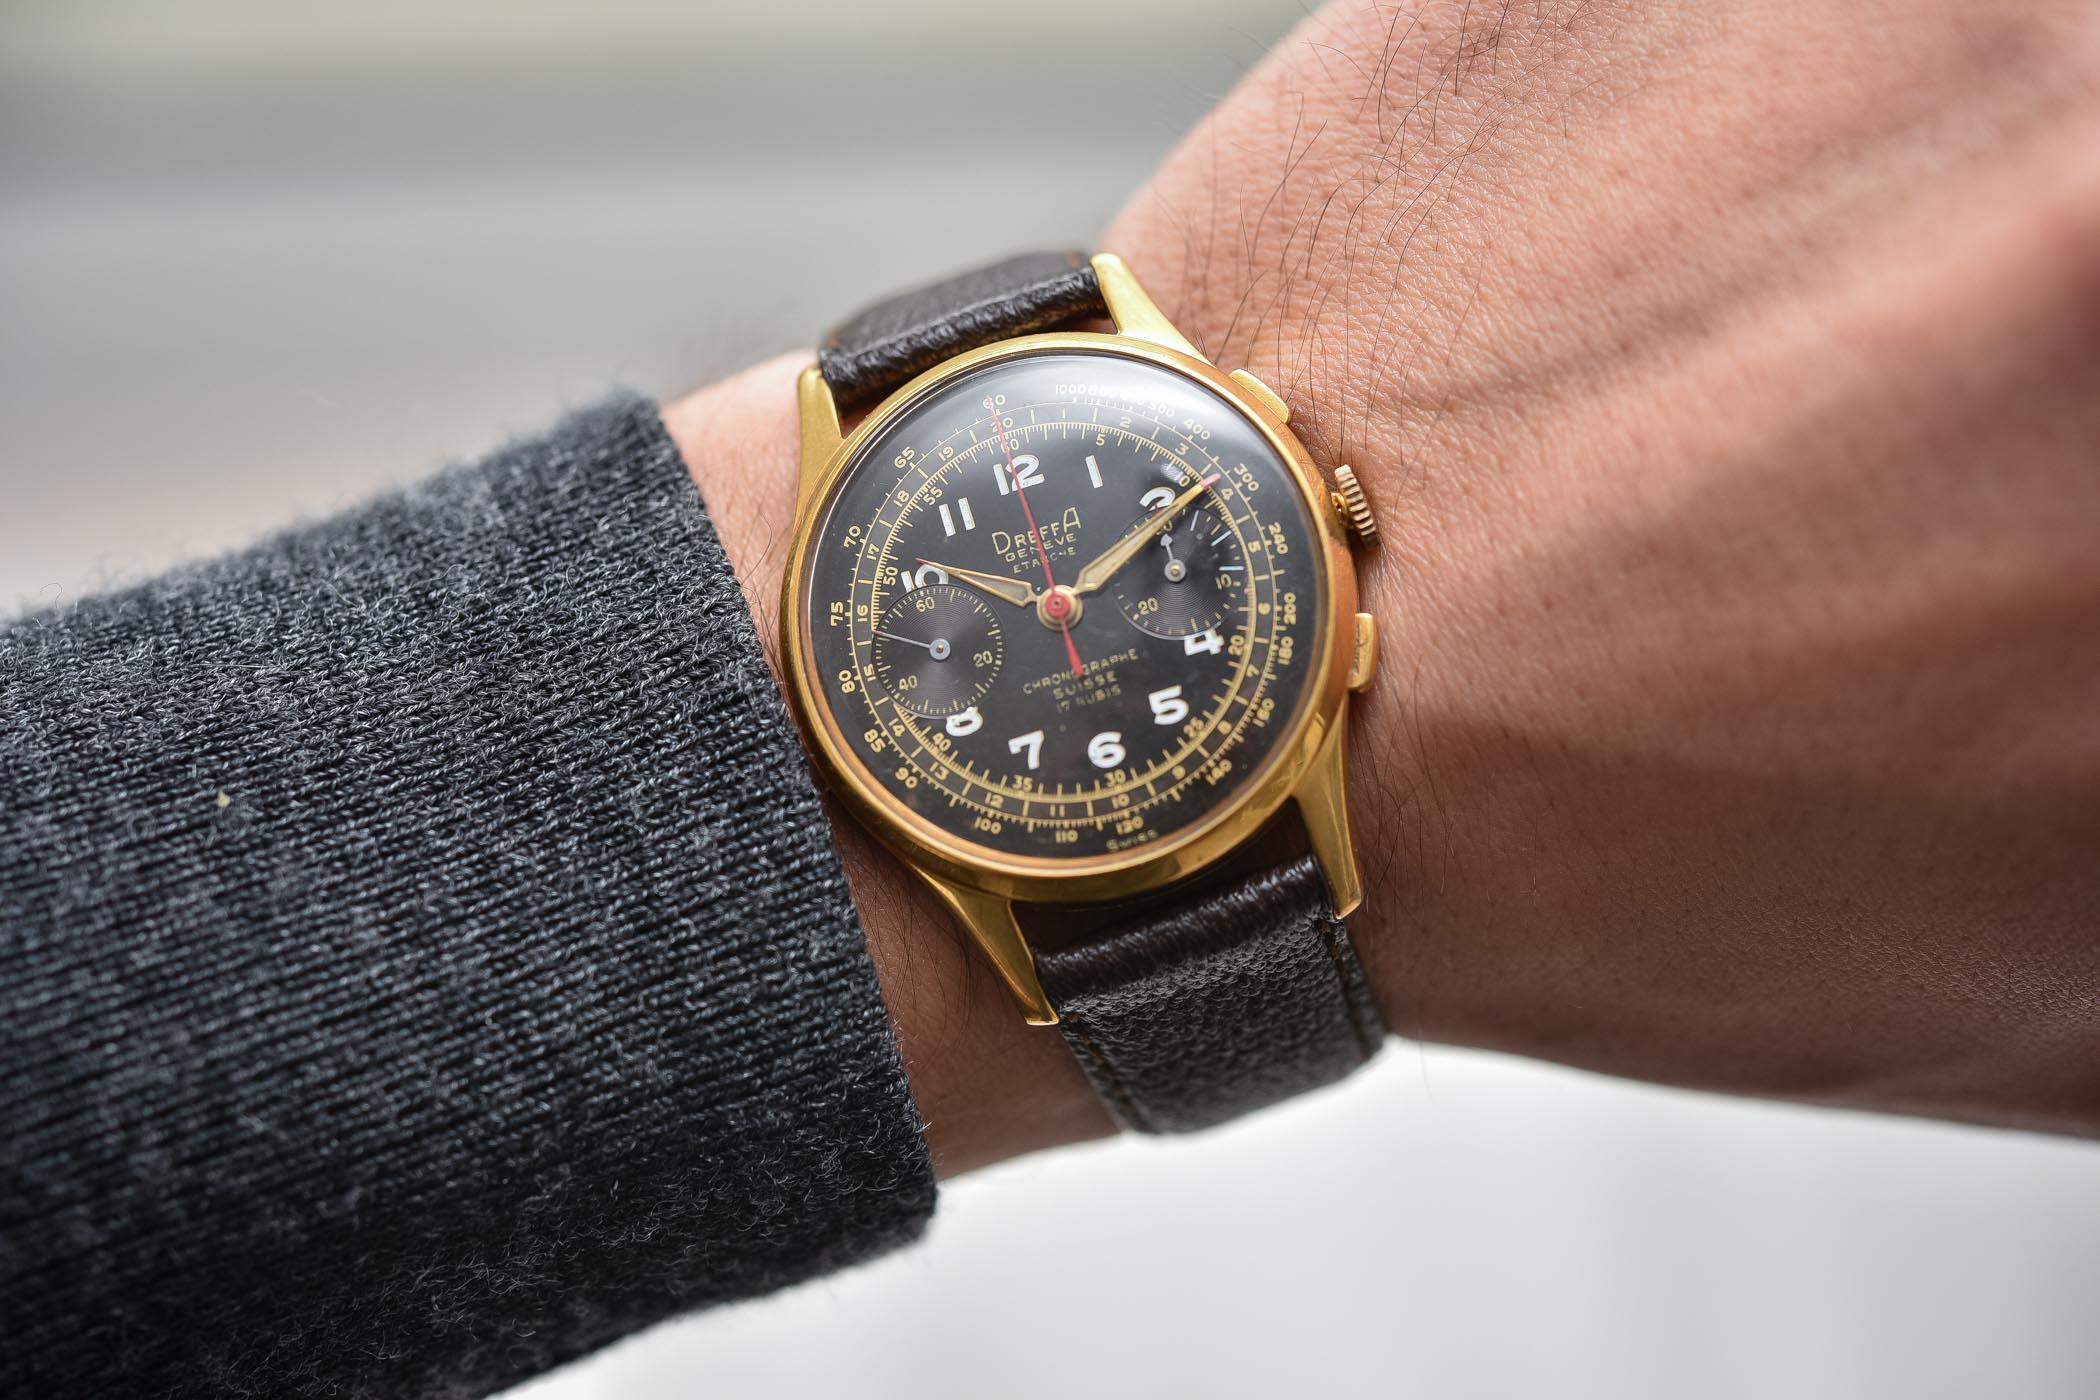 History of Chronographe Suisse Landeron Dreffa Ultimor Olympic - 1